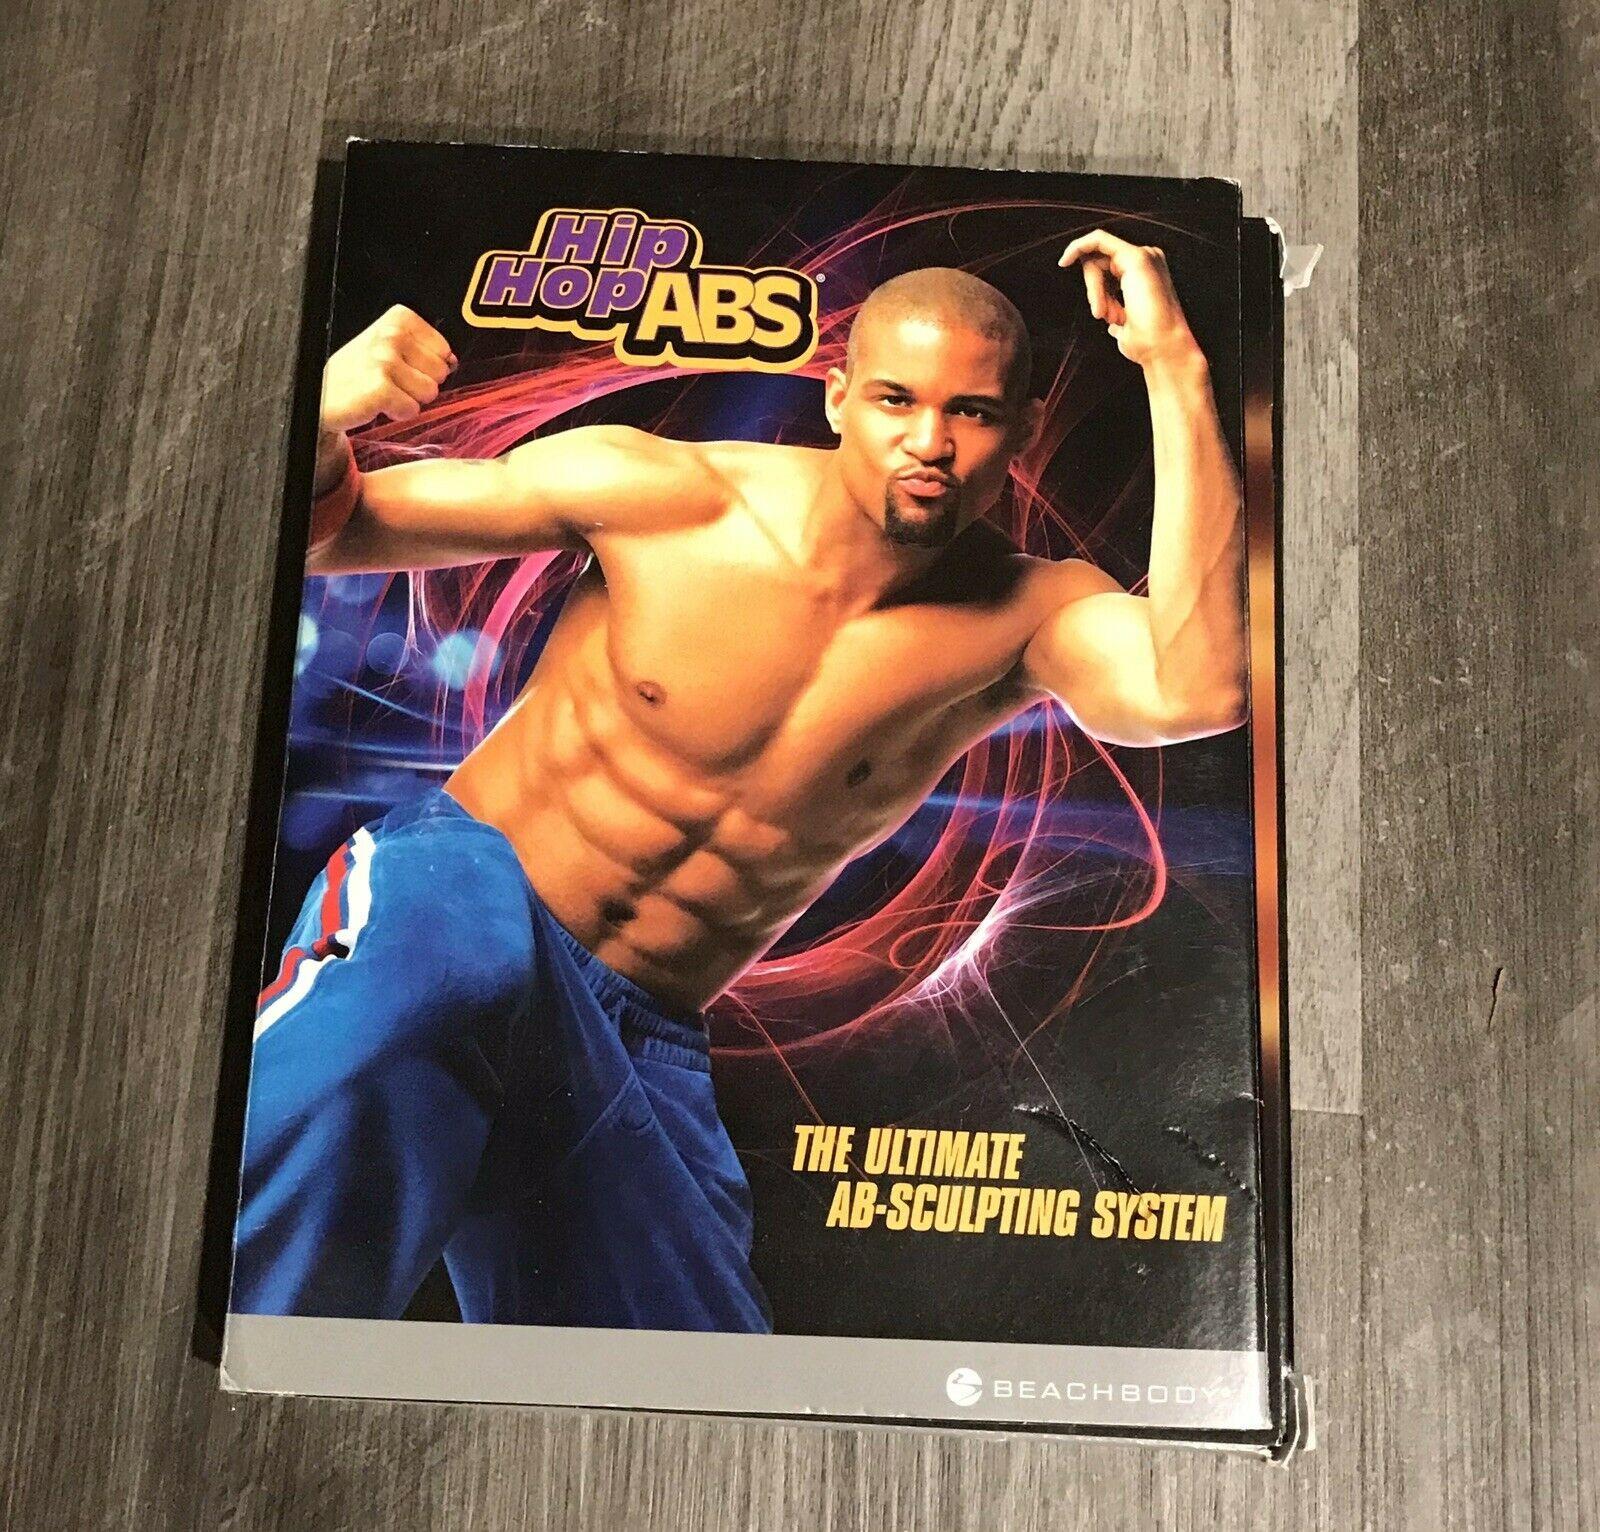 Beachbody Hip Hop ABS 3 DVD SHAUN T'S HIP HOP ABS ULTIMATE AB SCULPTING SYSTEM image 3